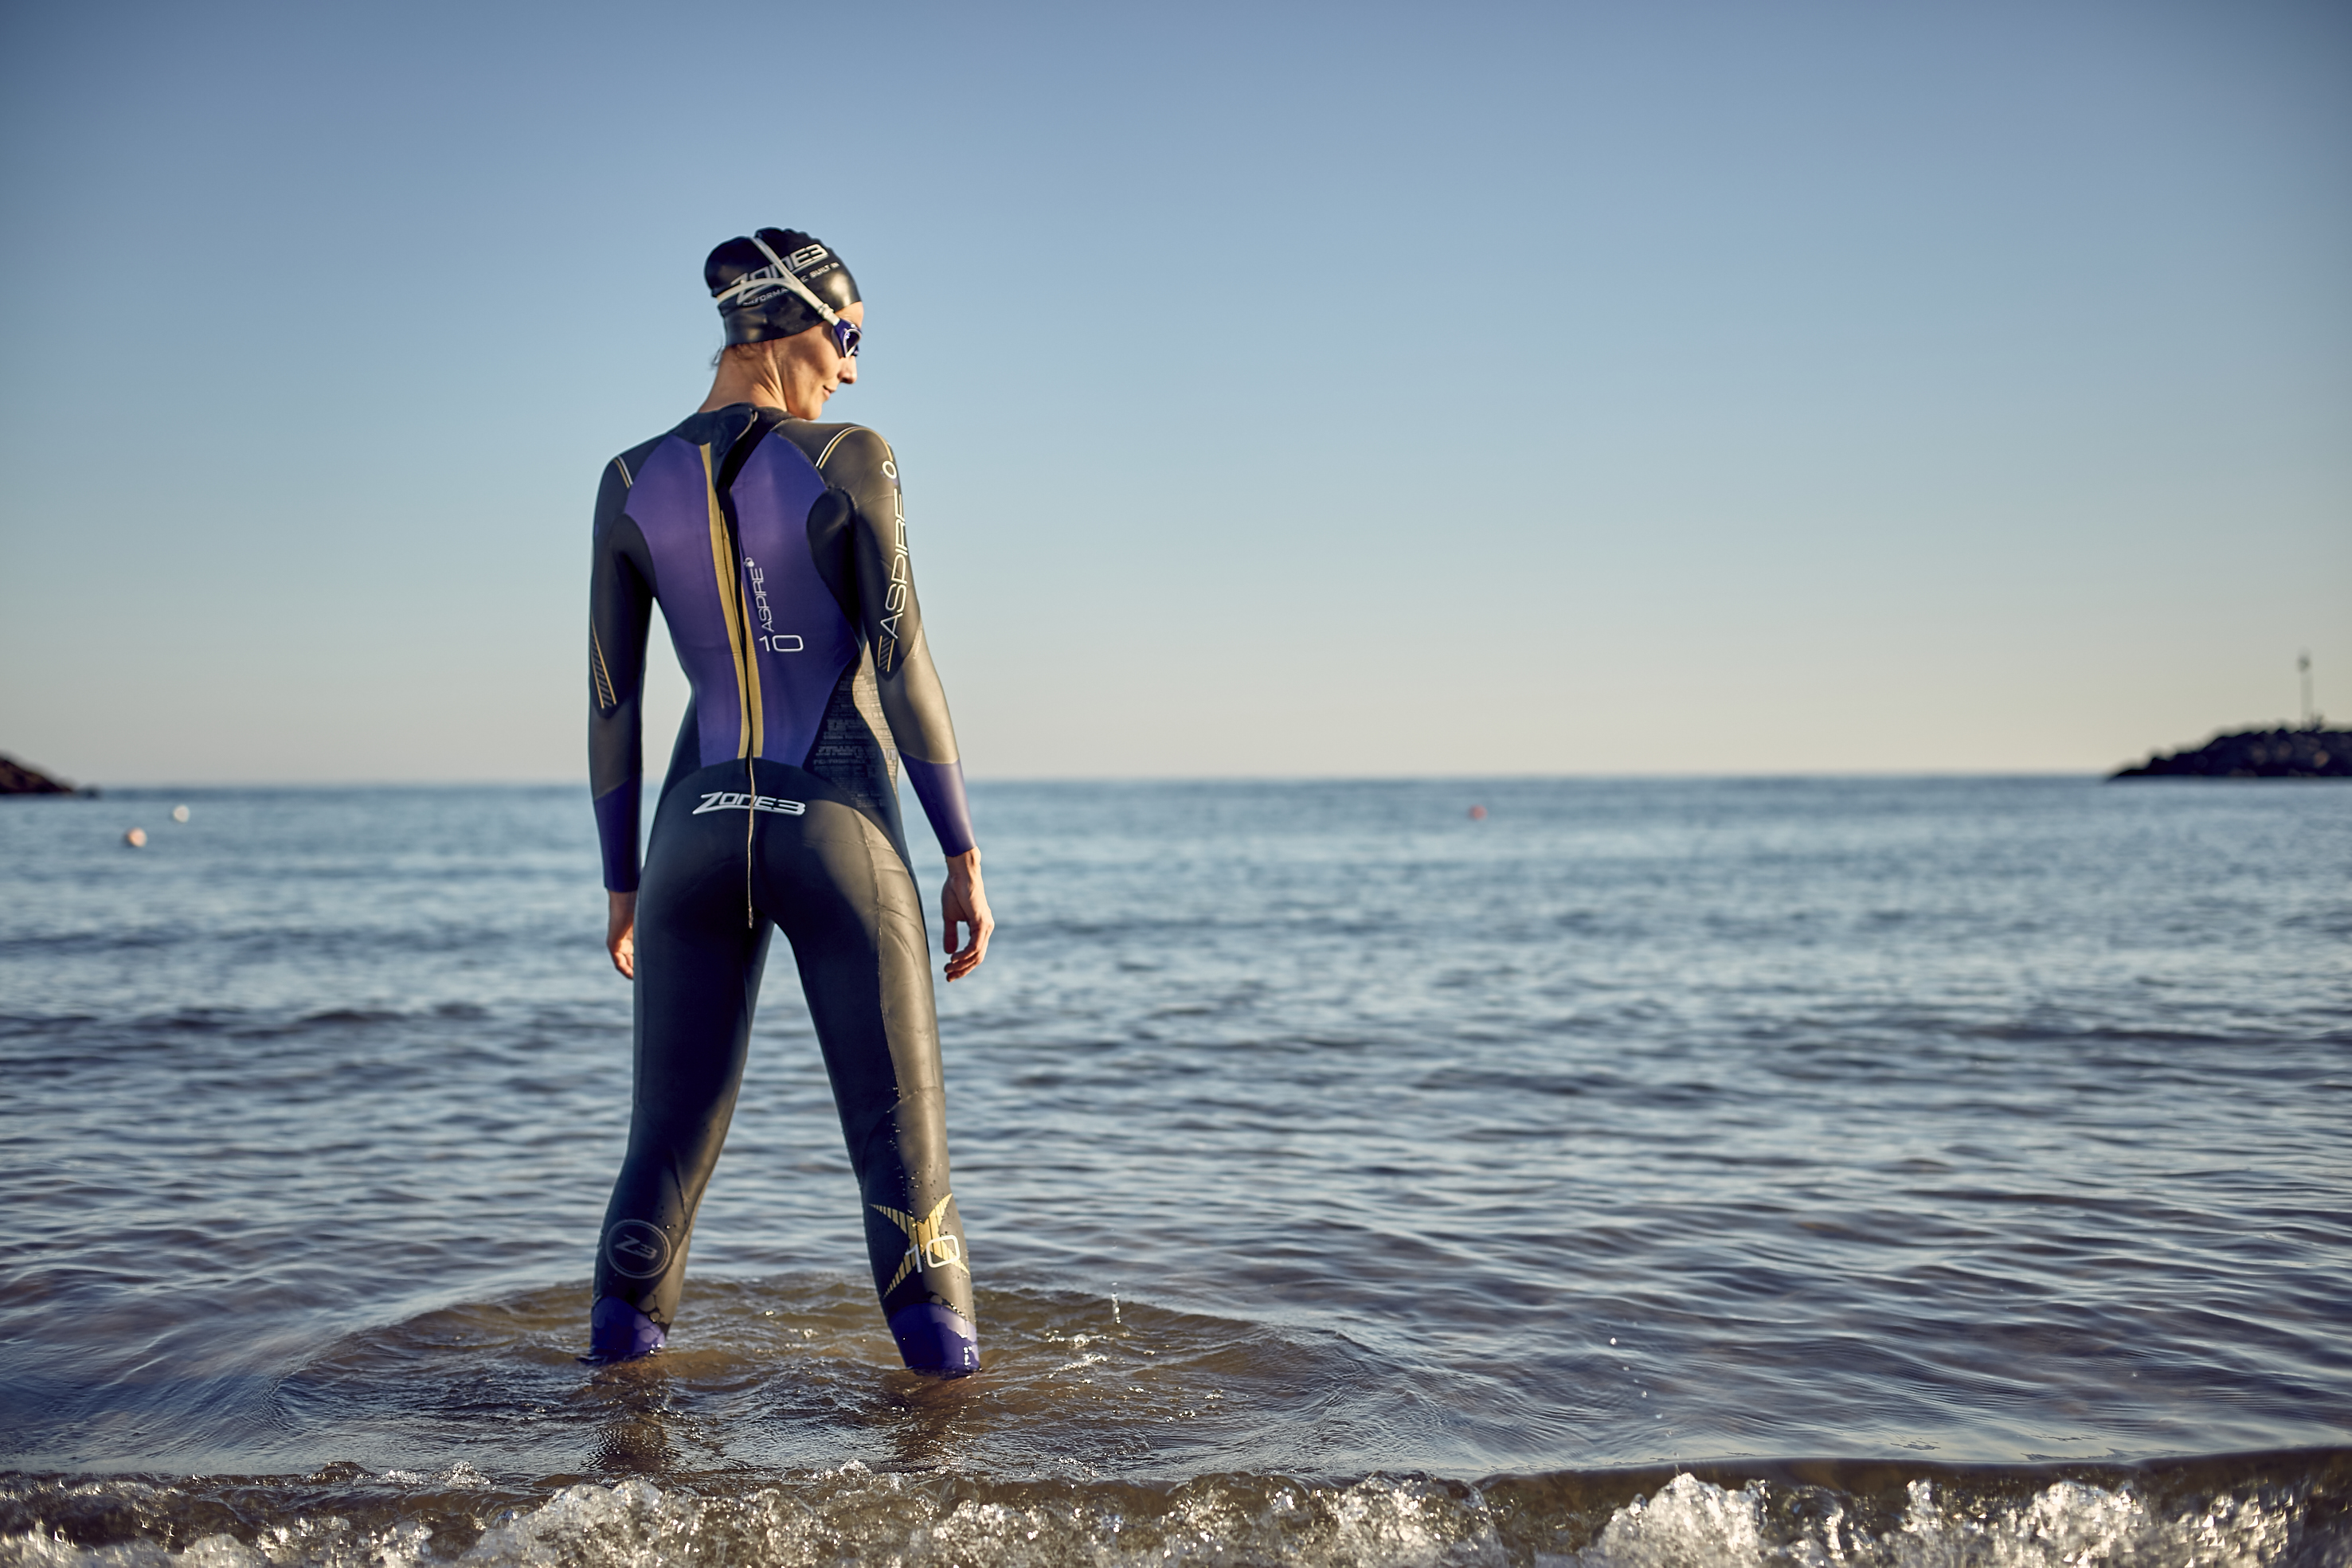 women-s-aspire-wetsuit-lifestyle-2-.jpg